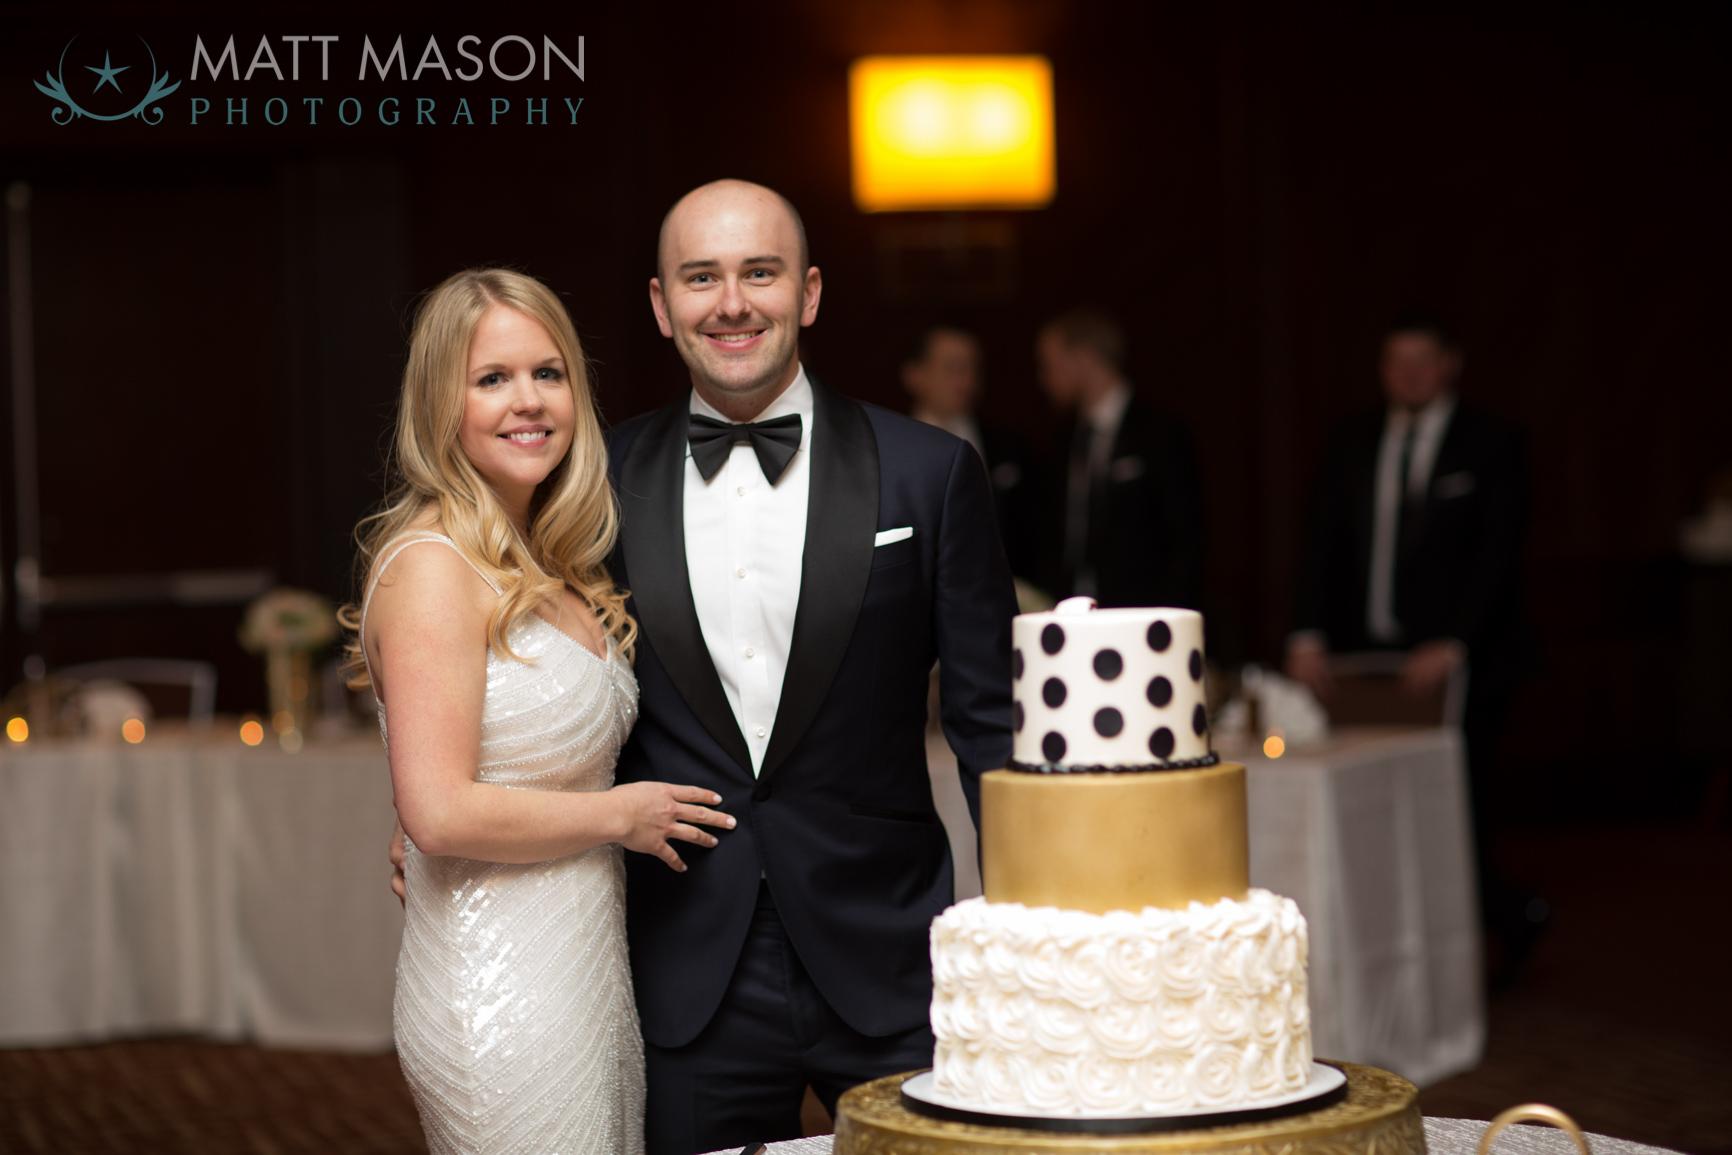 MattMasonPhotography-Becca+Nate-19.jpg